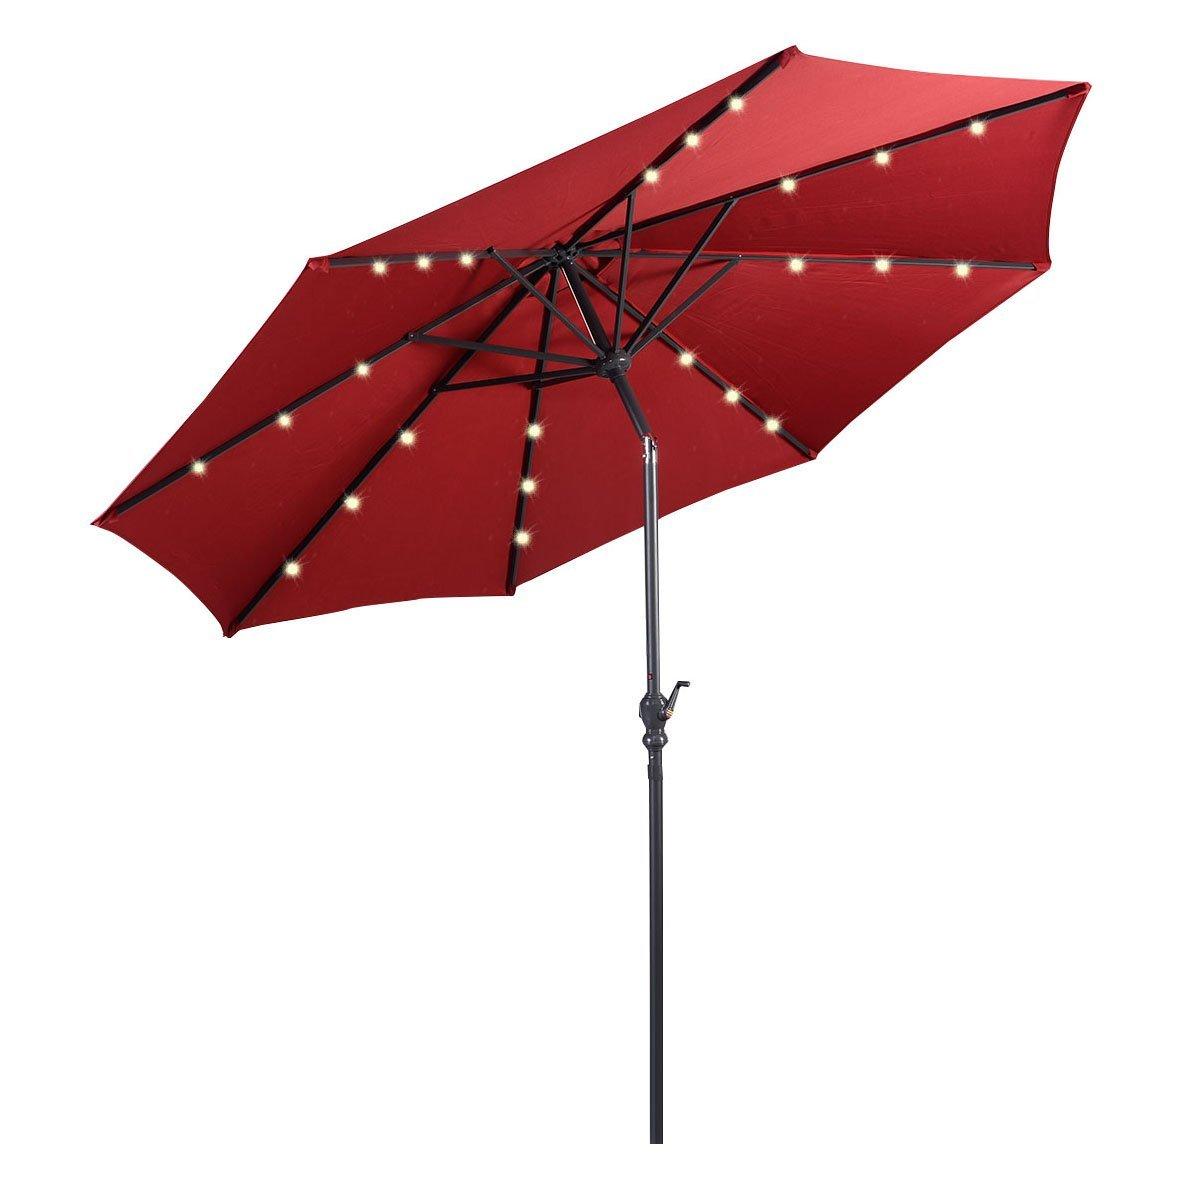 Patio Umbrellas And Umbrella Lights